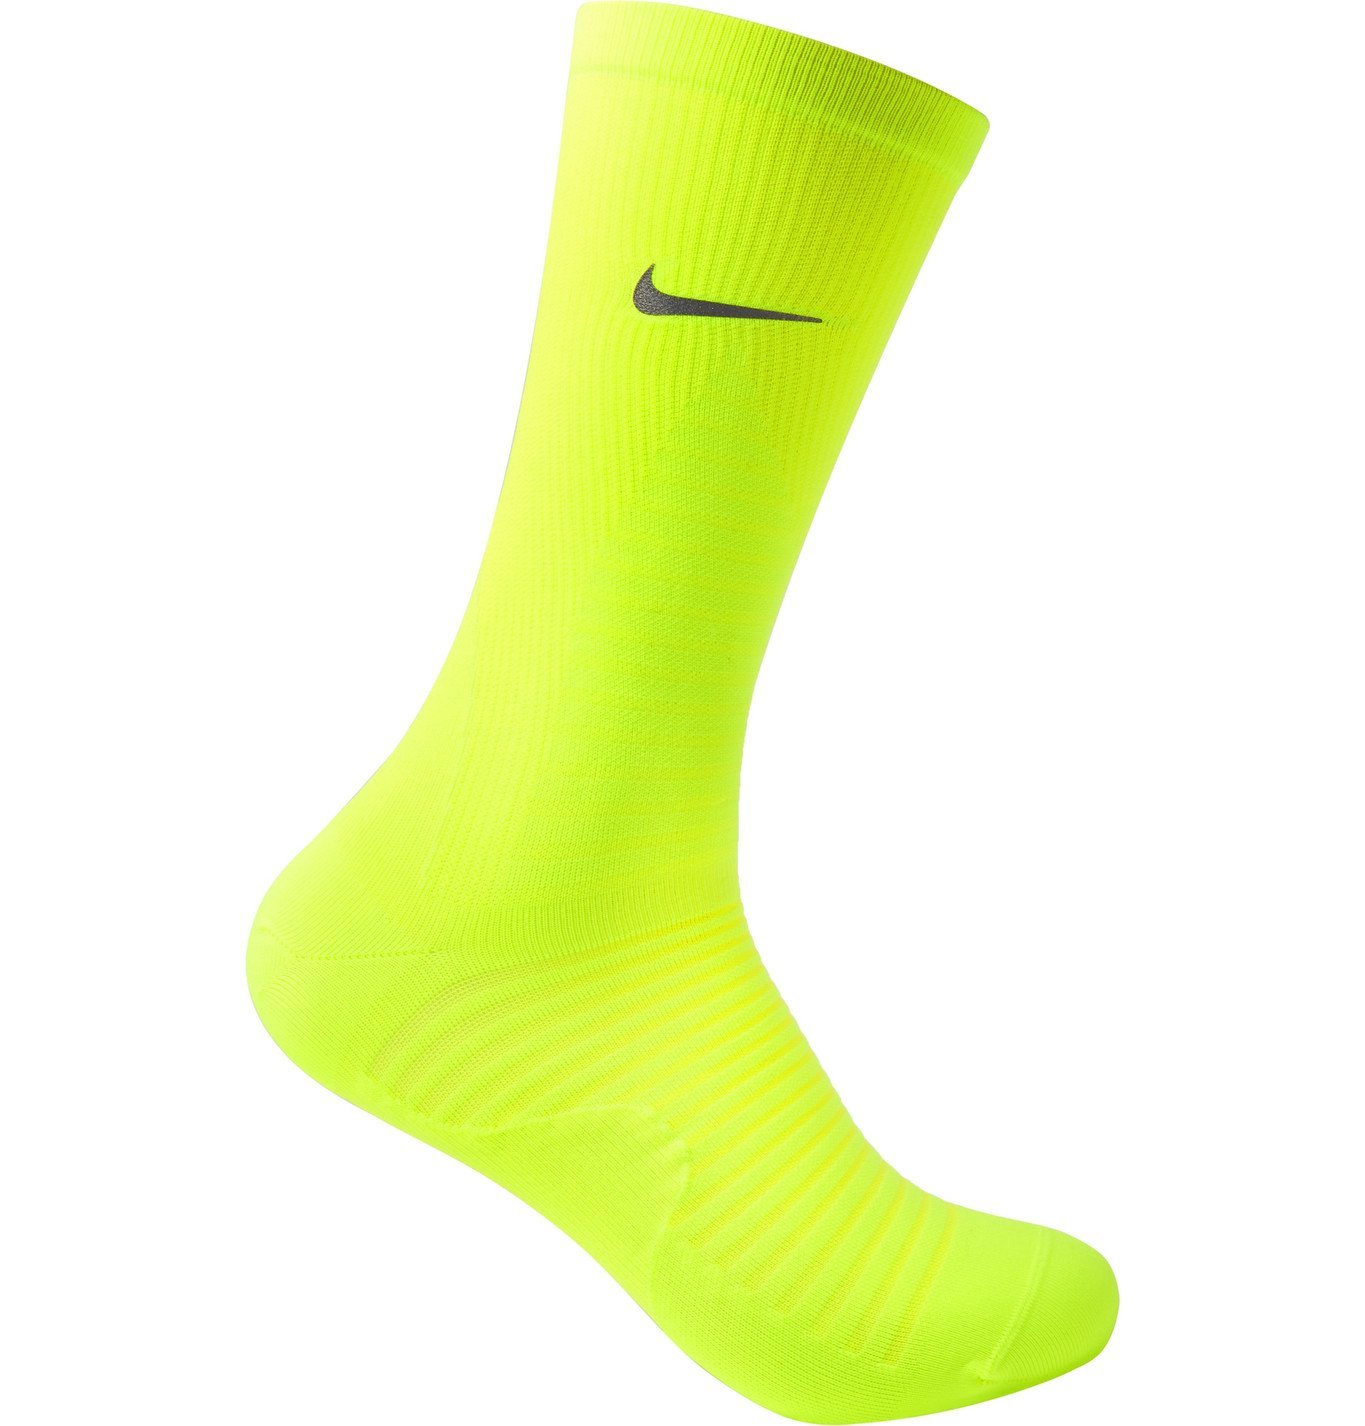 Nike Running - Spark Lightweight Stretch-Knit Socks - Yellow